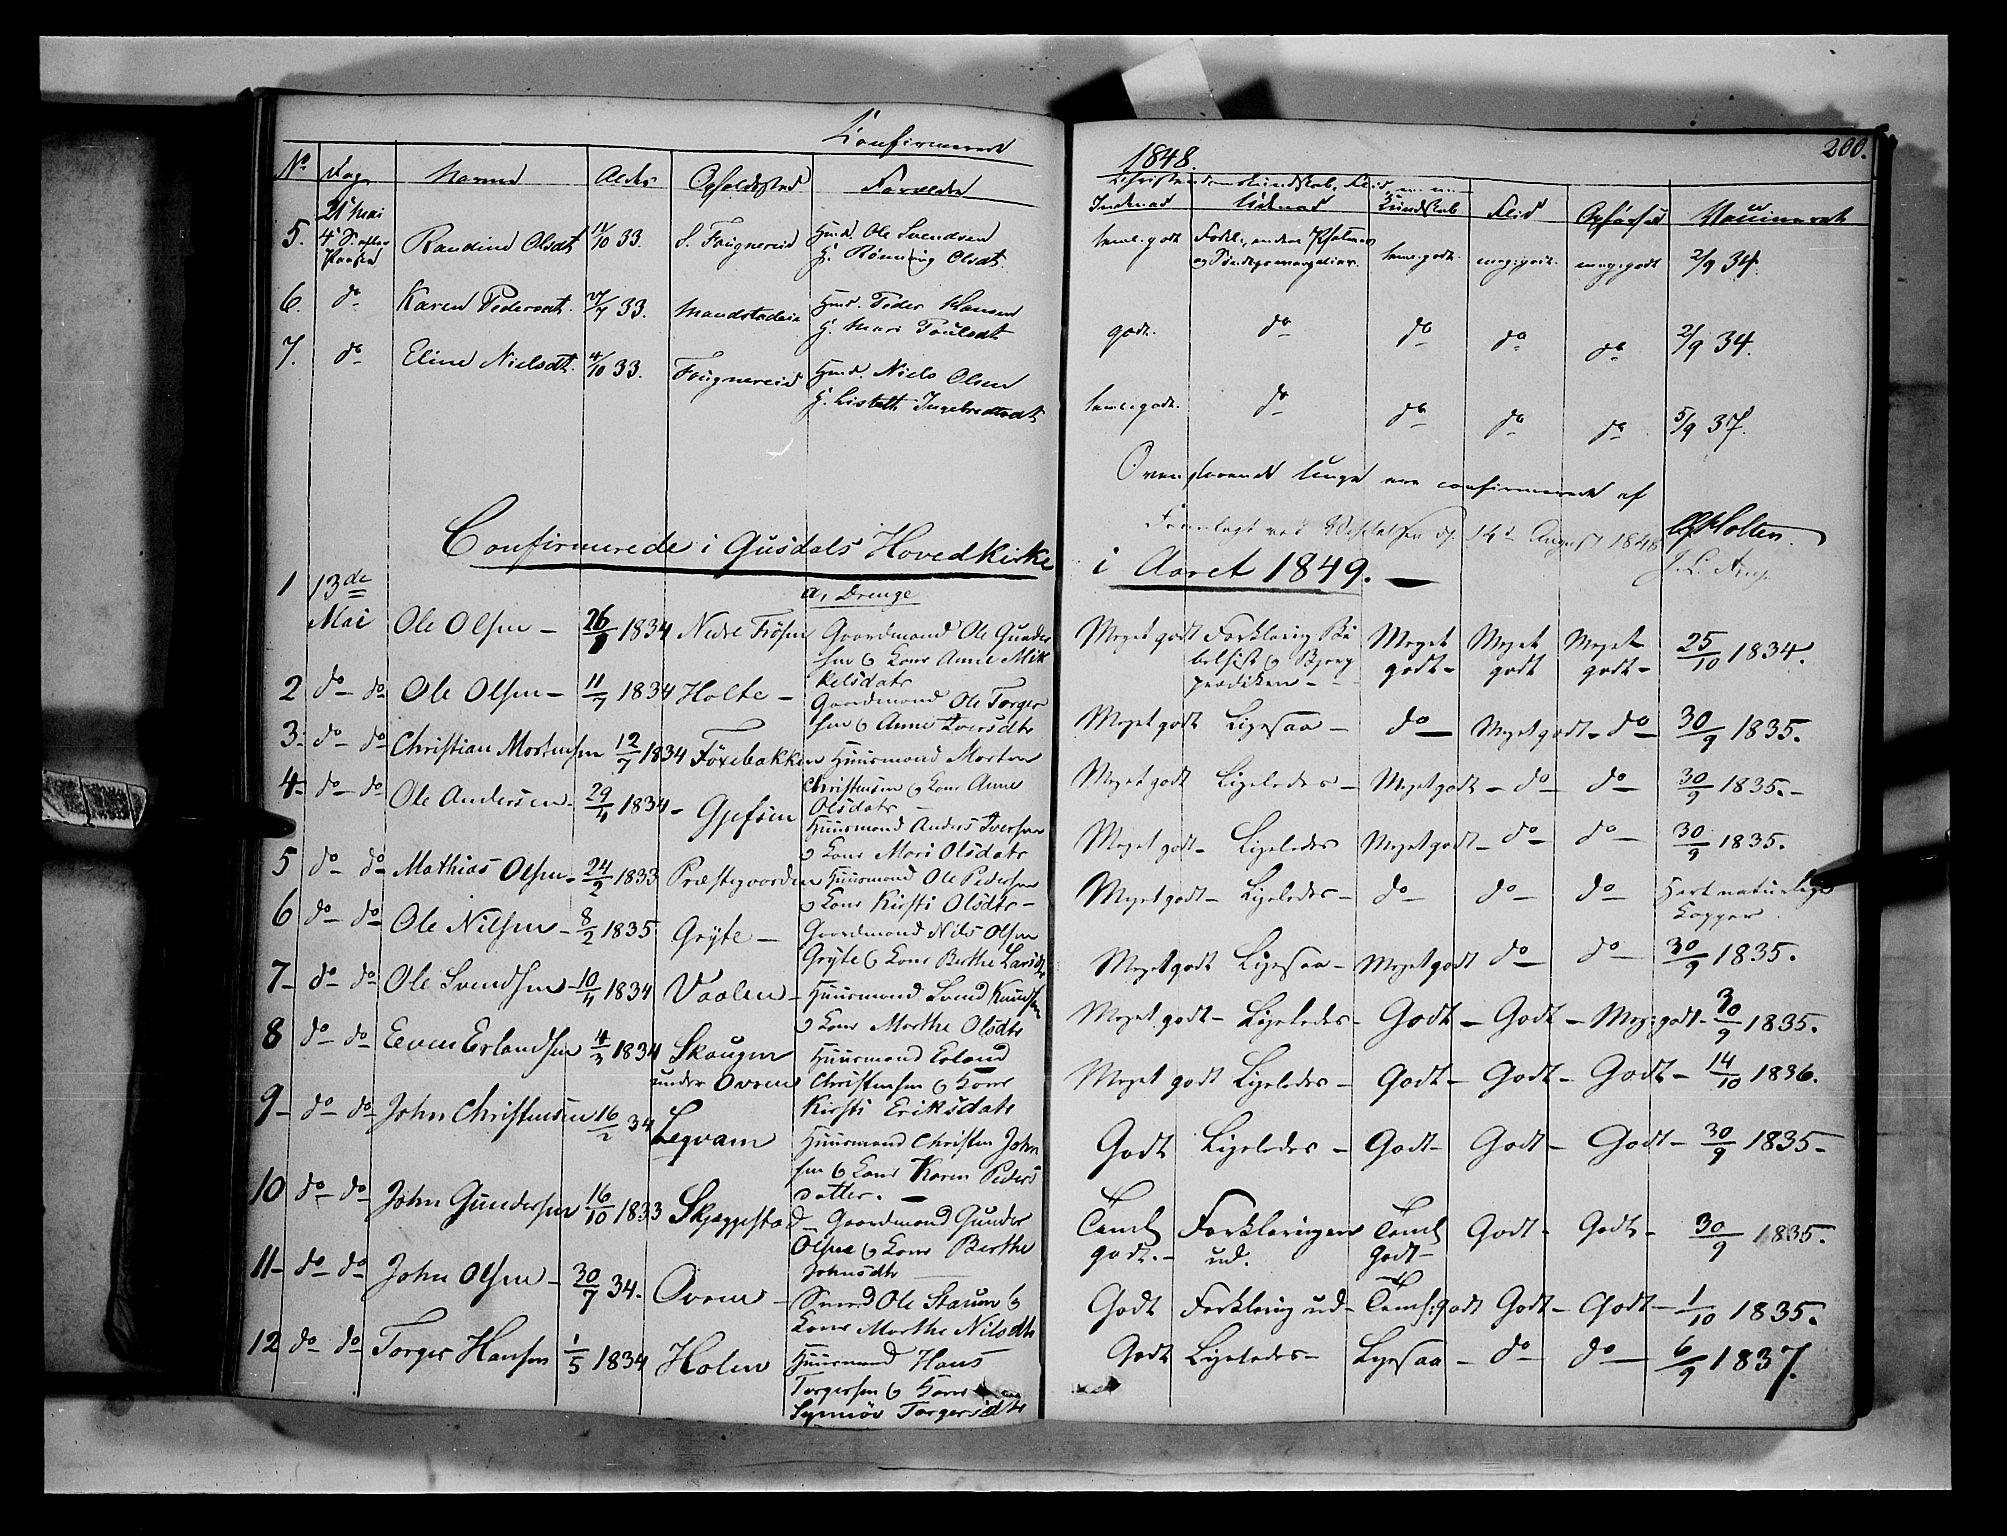 SAH, Gausdal prestekontor, Ministerialbok nr. 7, 1840-1850, s. 200